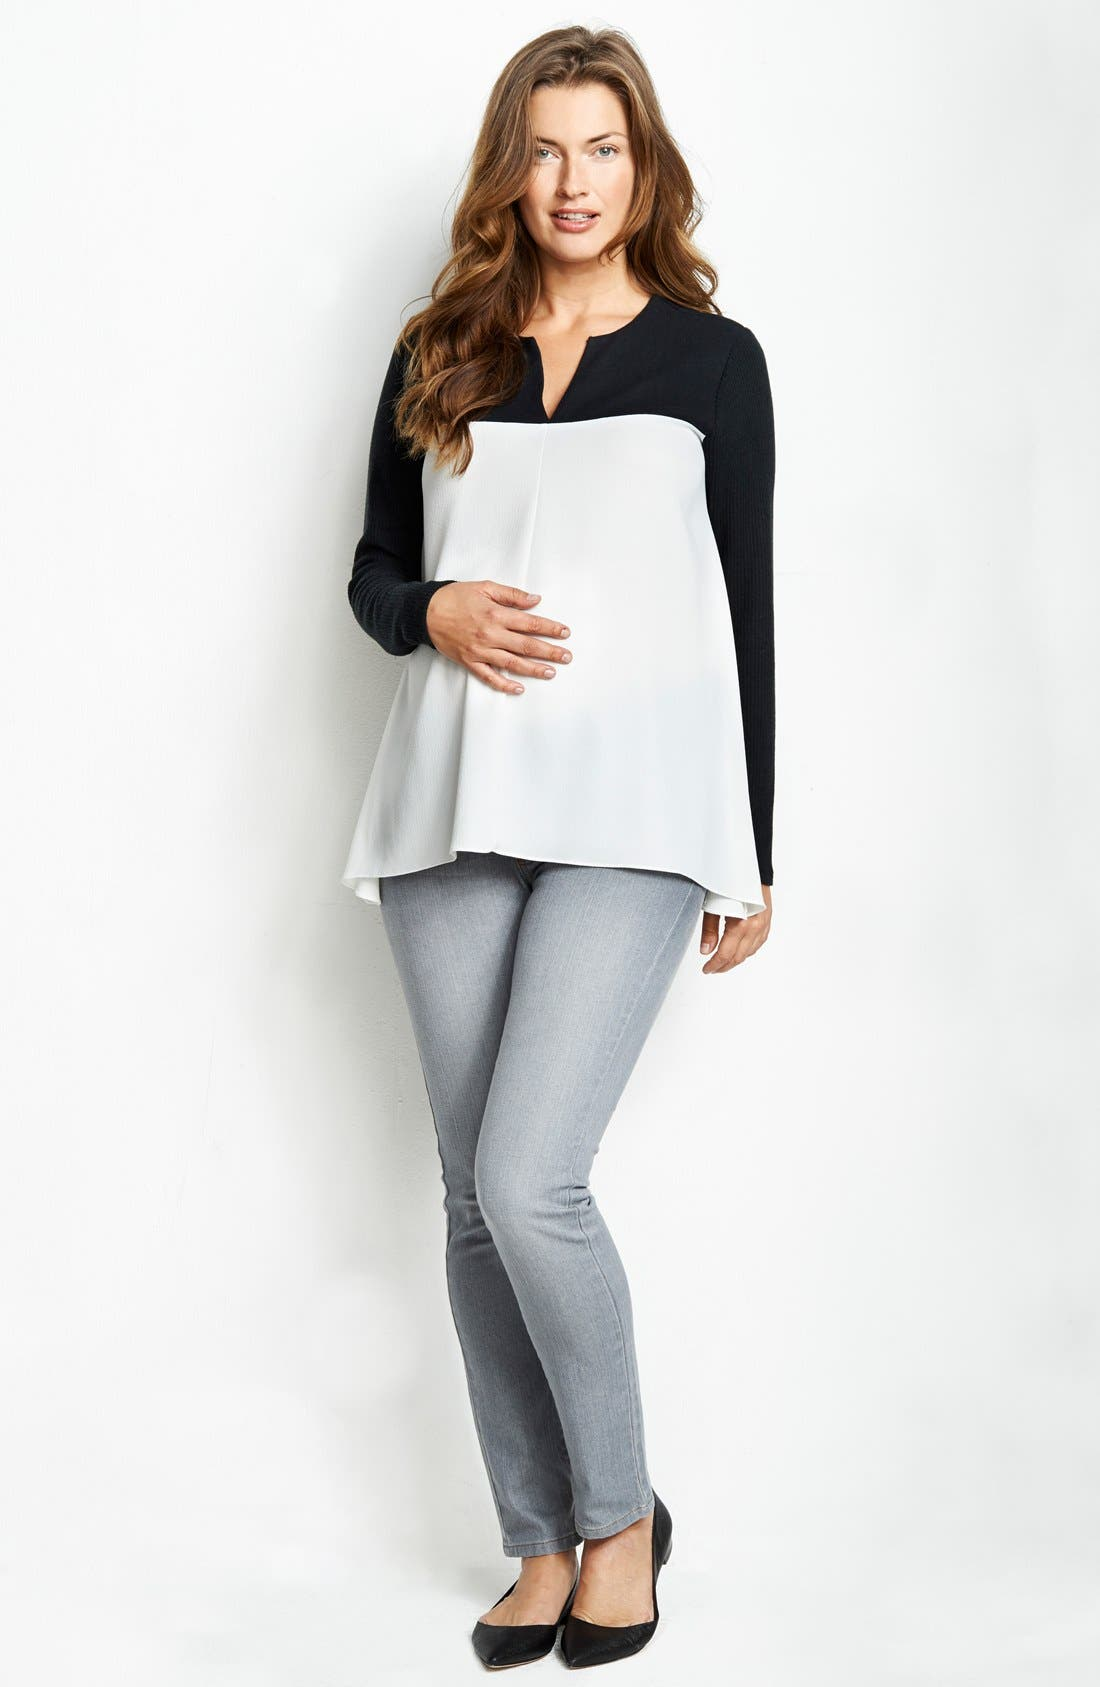 Main Image - Maternal America Baby Doll Maternity Top